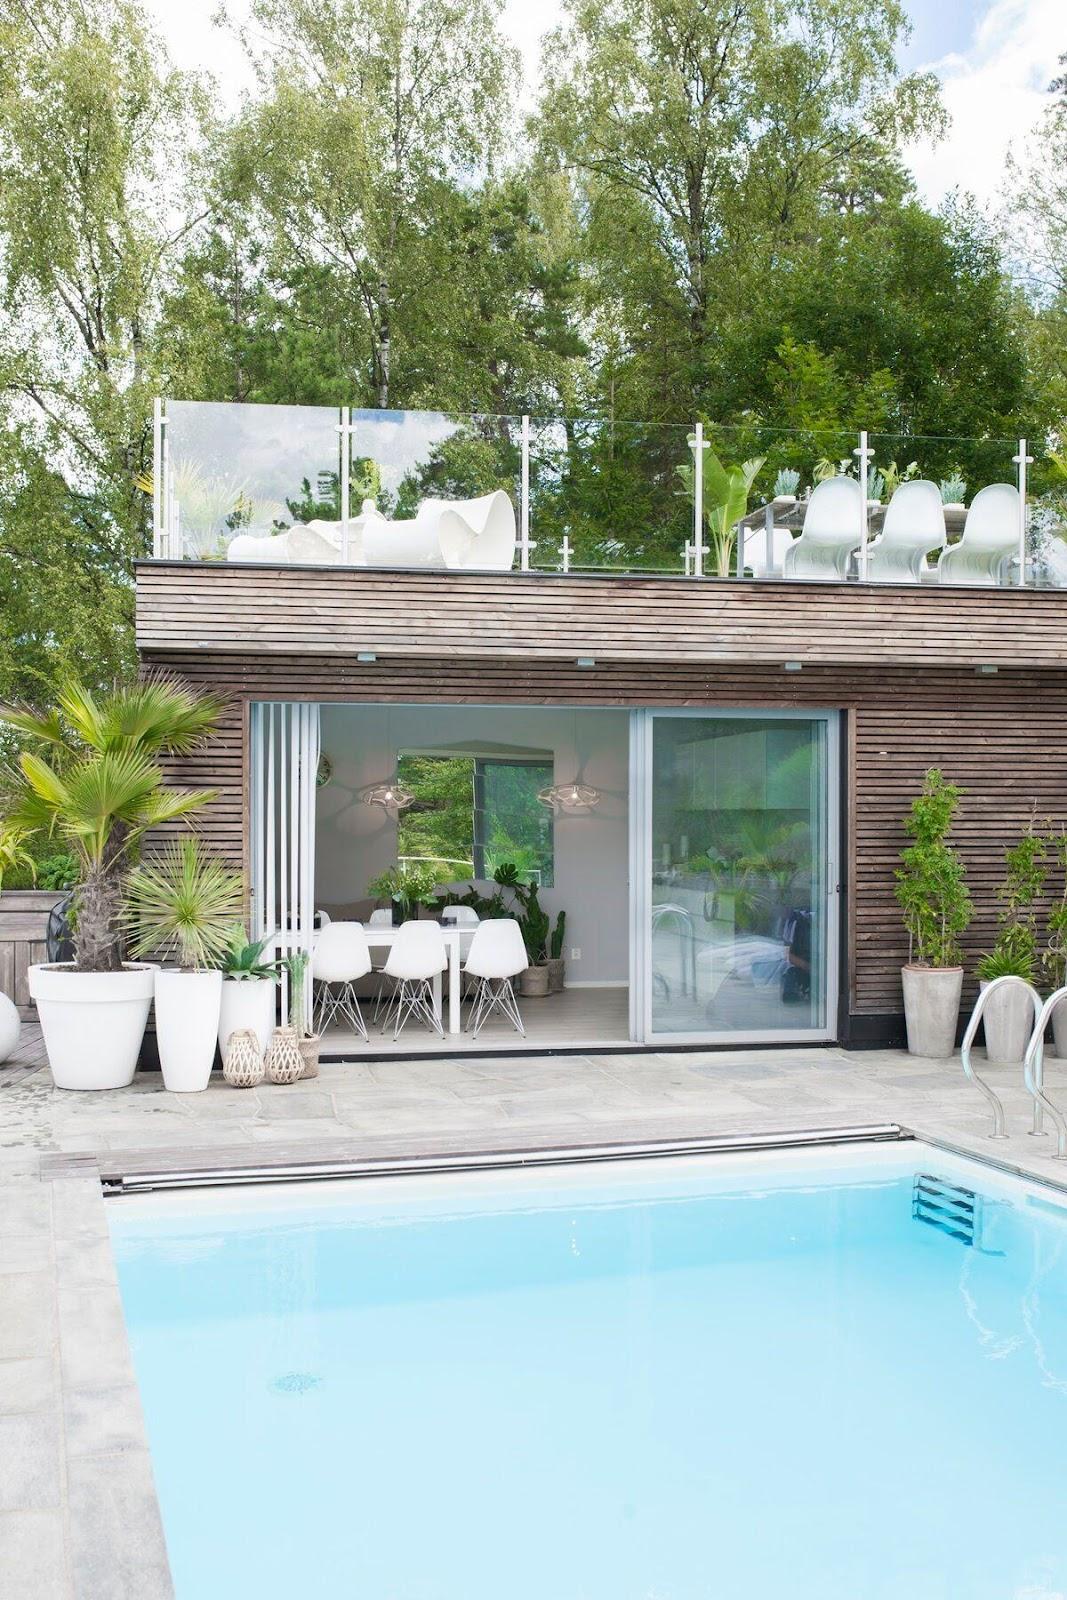 terrasse bygget med Kebony materialer